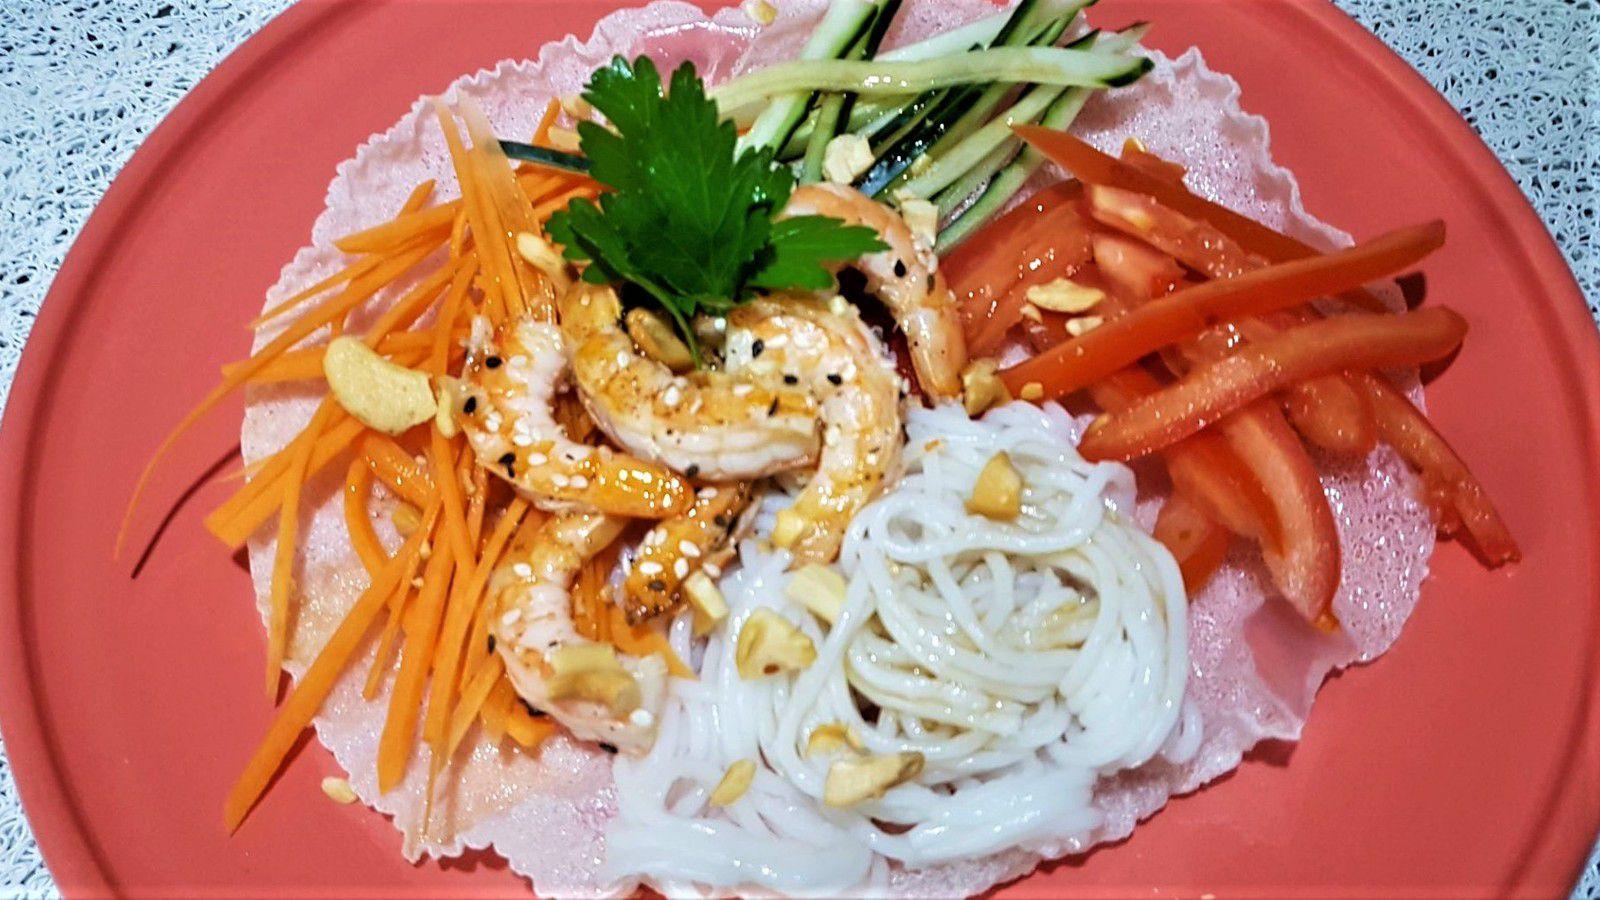 salade asiatique croustillante aux gambas